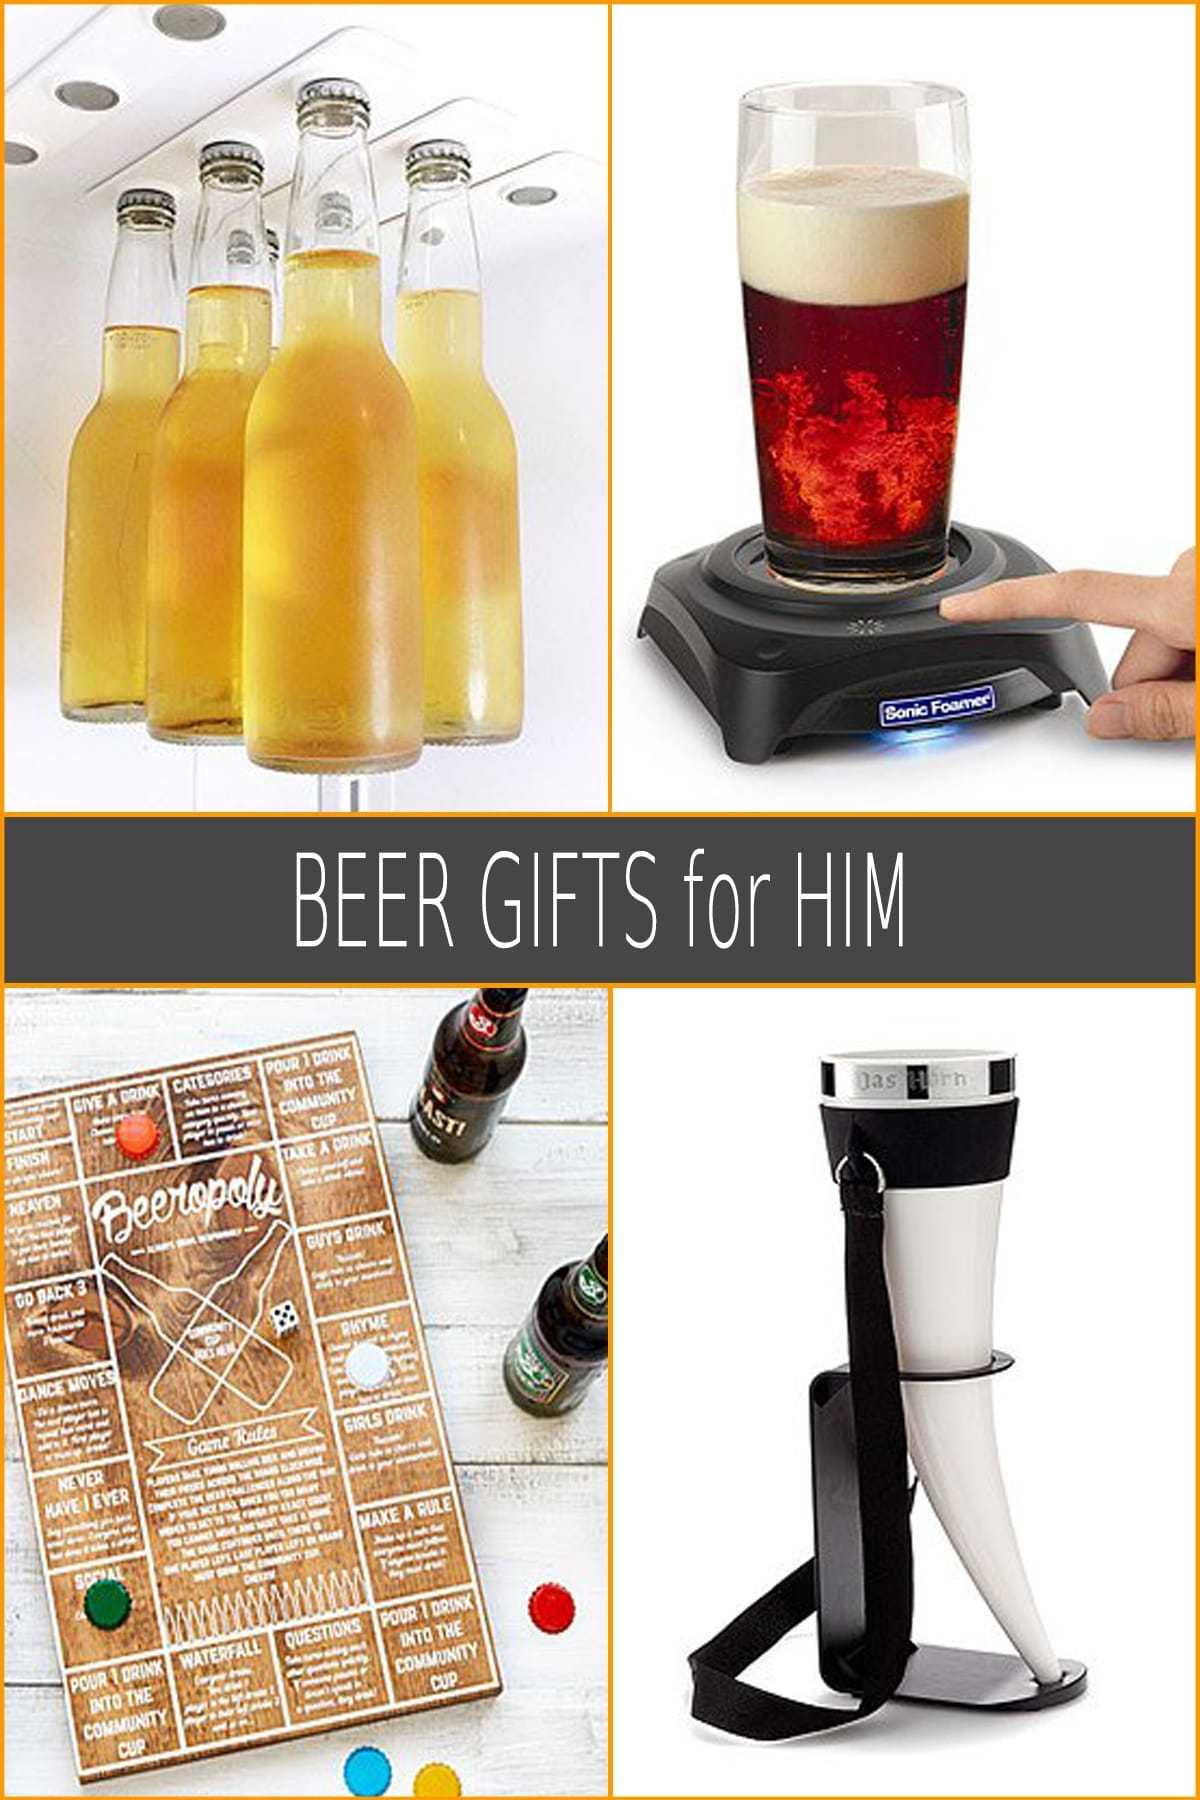 beer gifts for men